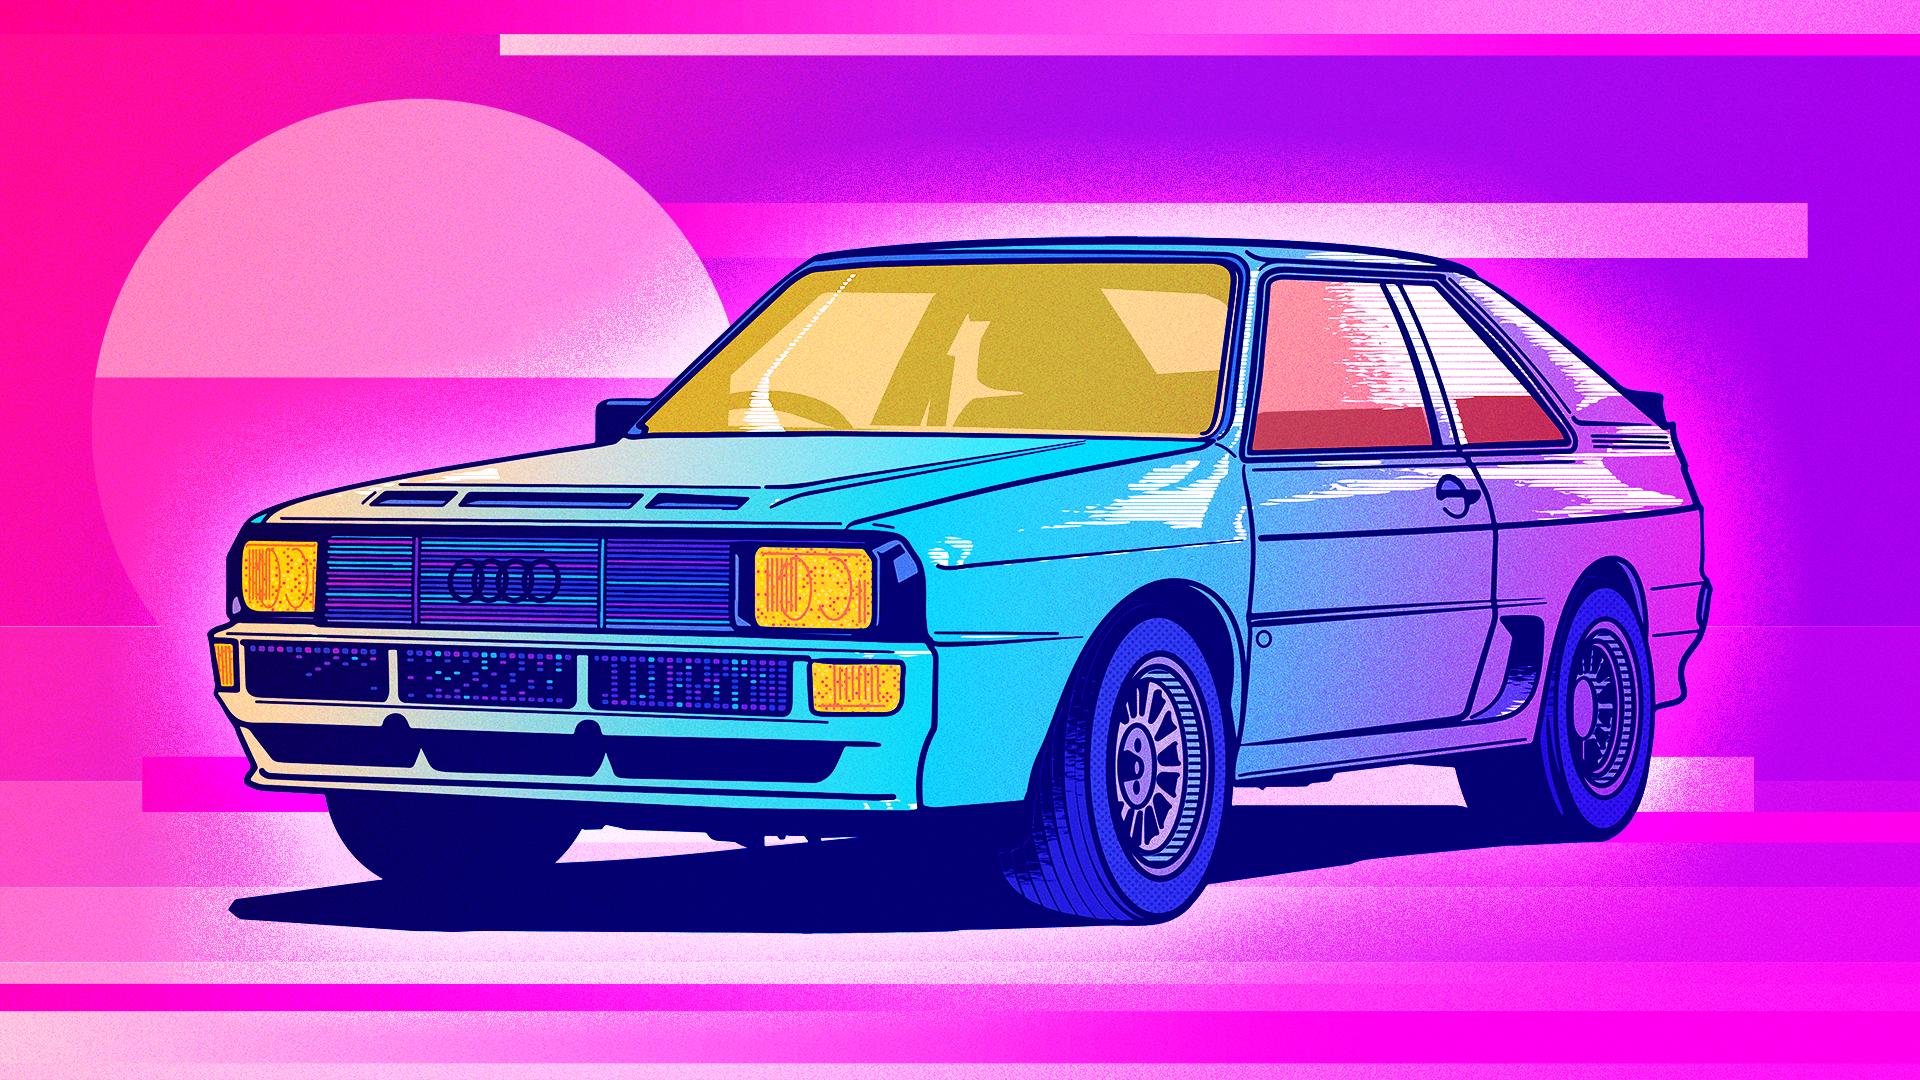 Audi_wallpaper.jpg